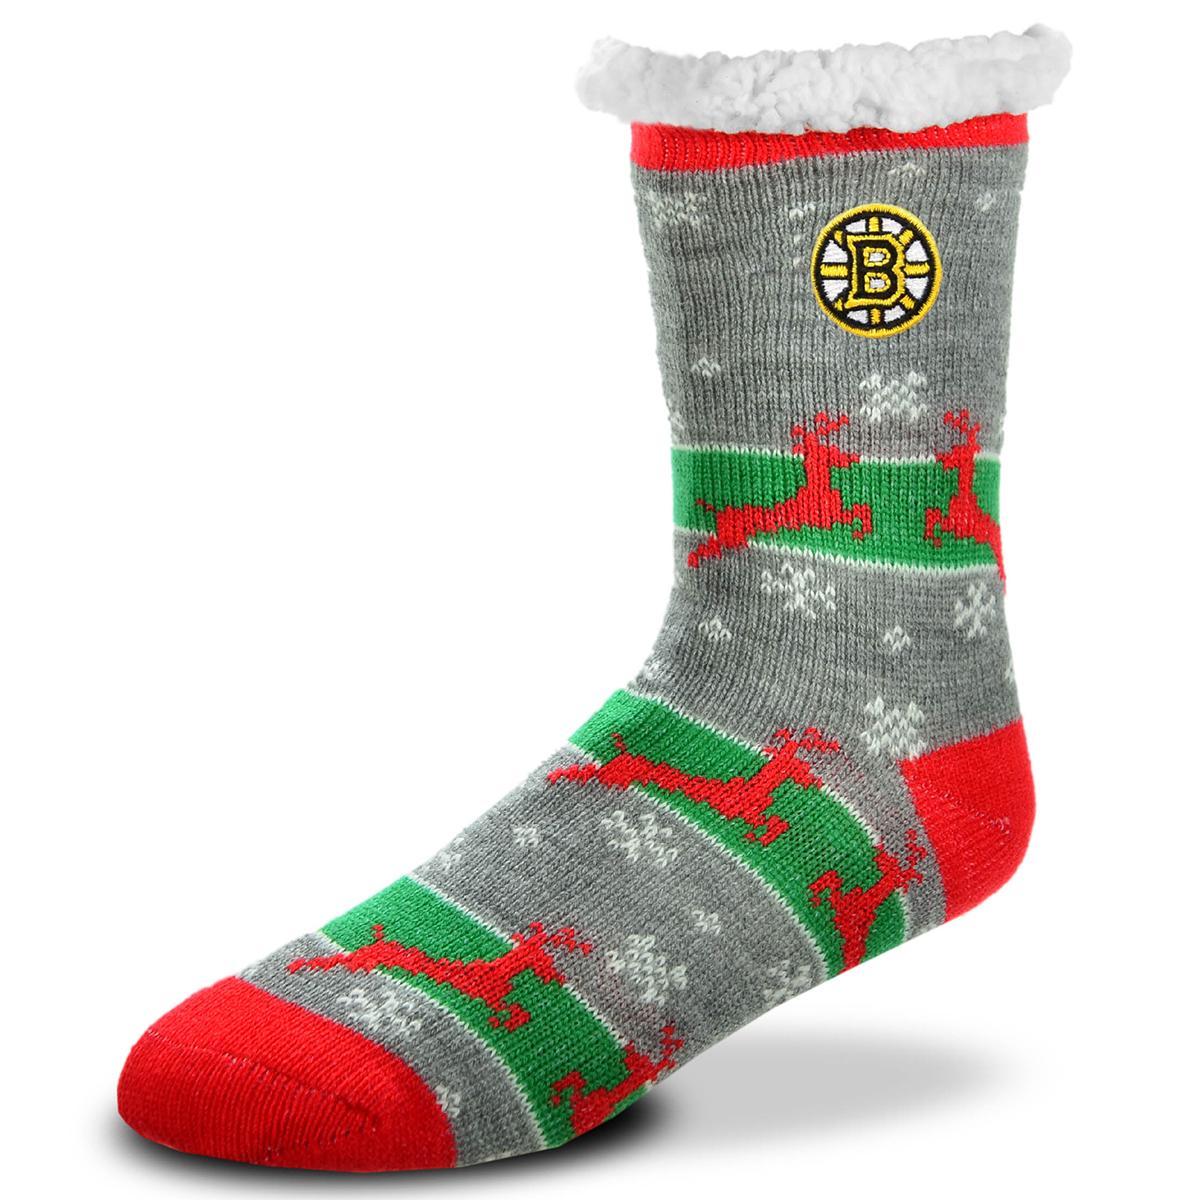 Boston Bruins Unisex Sherpa Lined Holiday Reindeer Socks